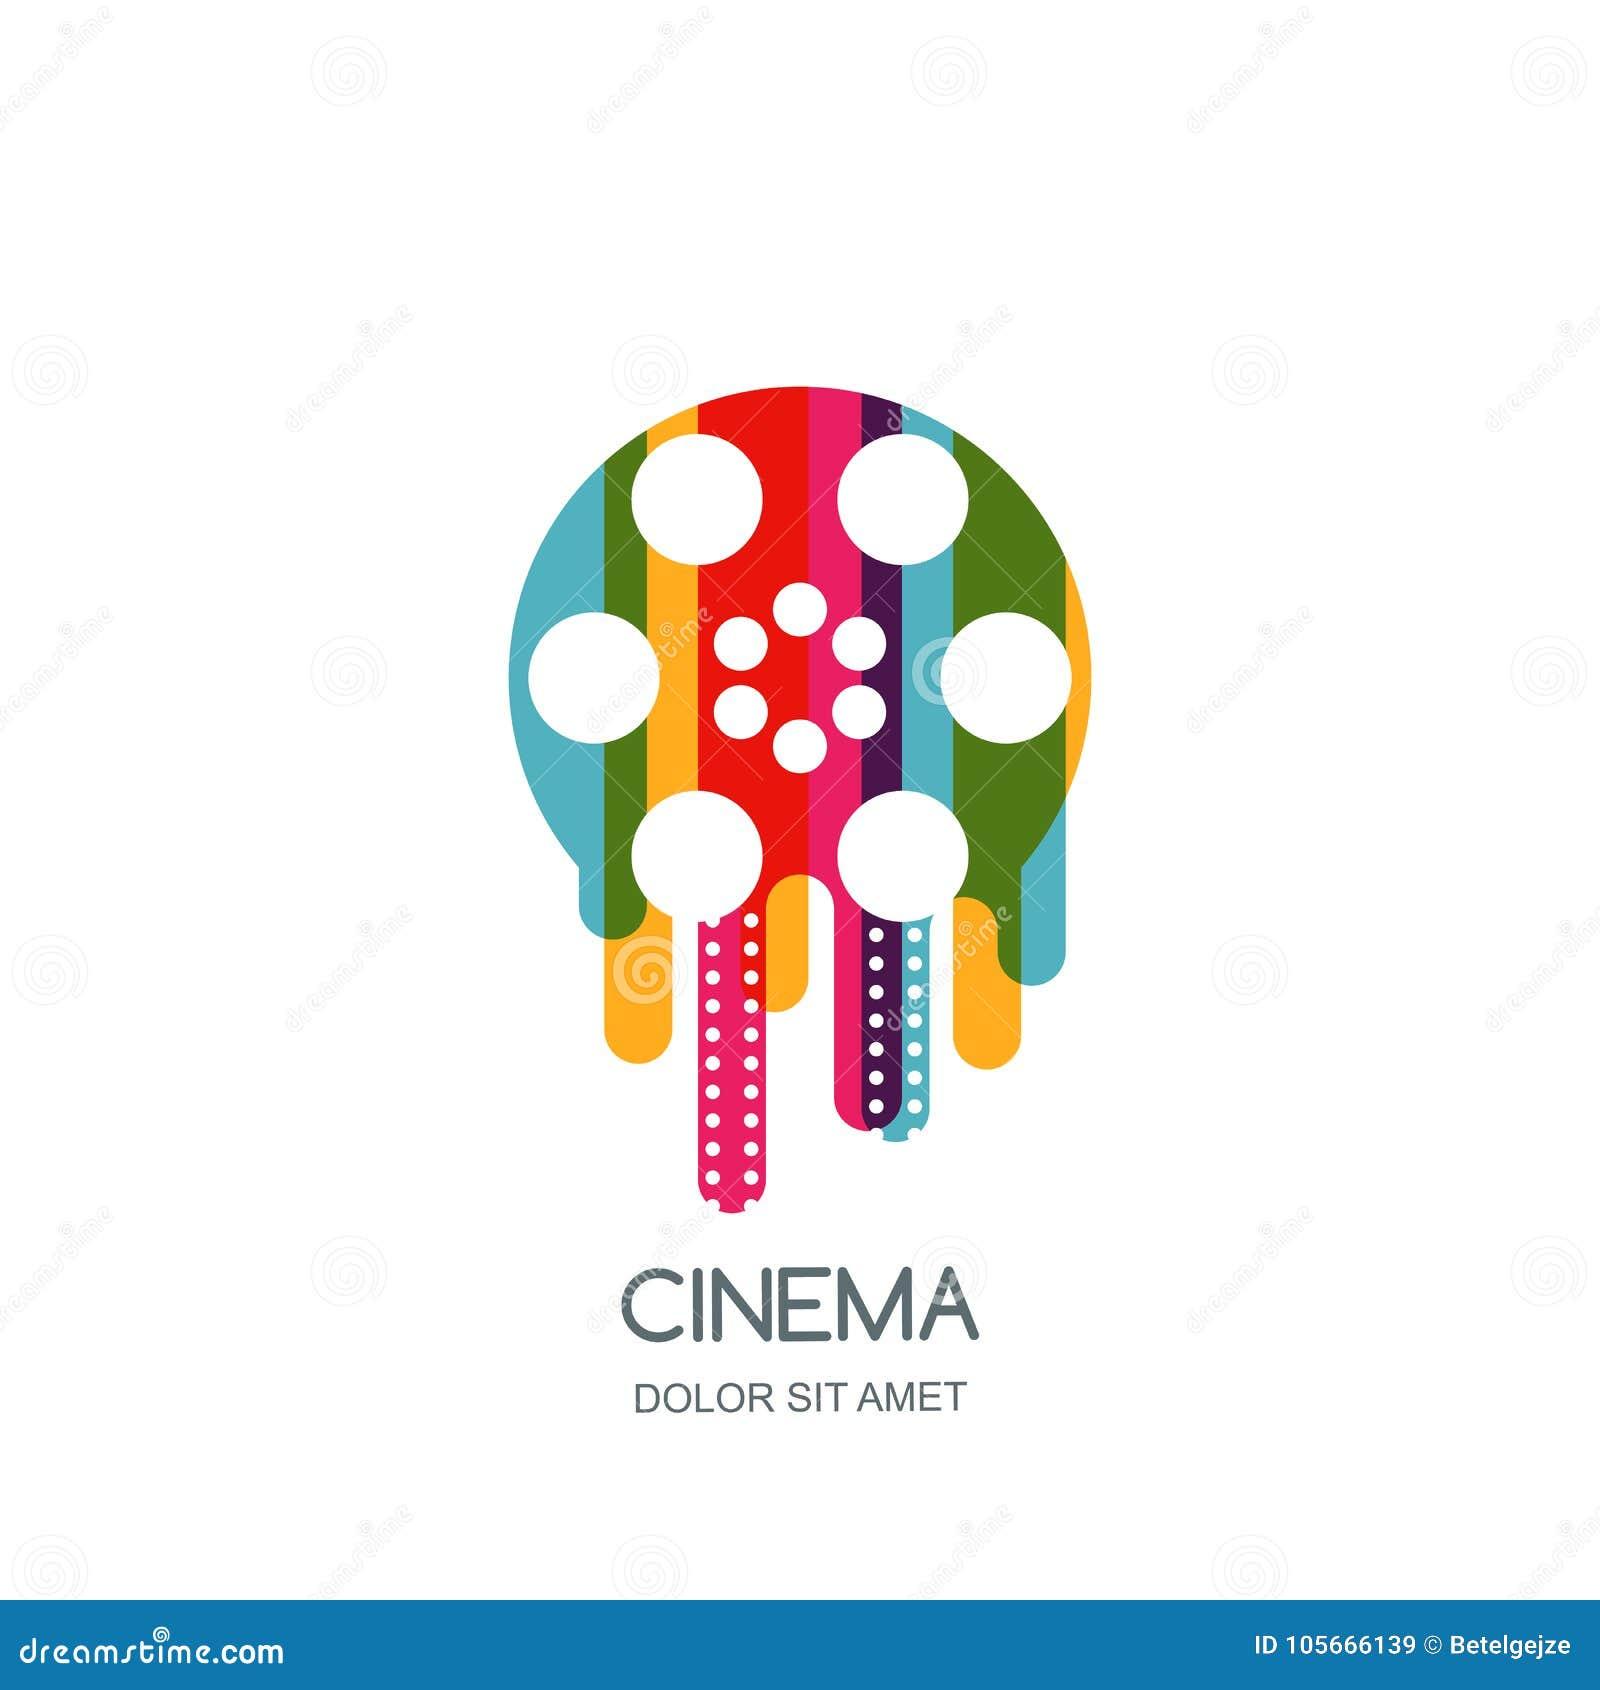 Cinema festival logo, icon, emblem design template. Colorful liquid film reel and filmstrip. Movie time concept